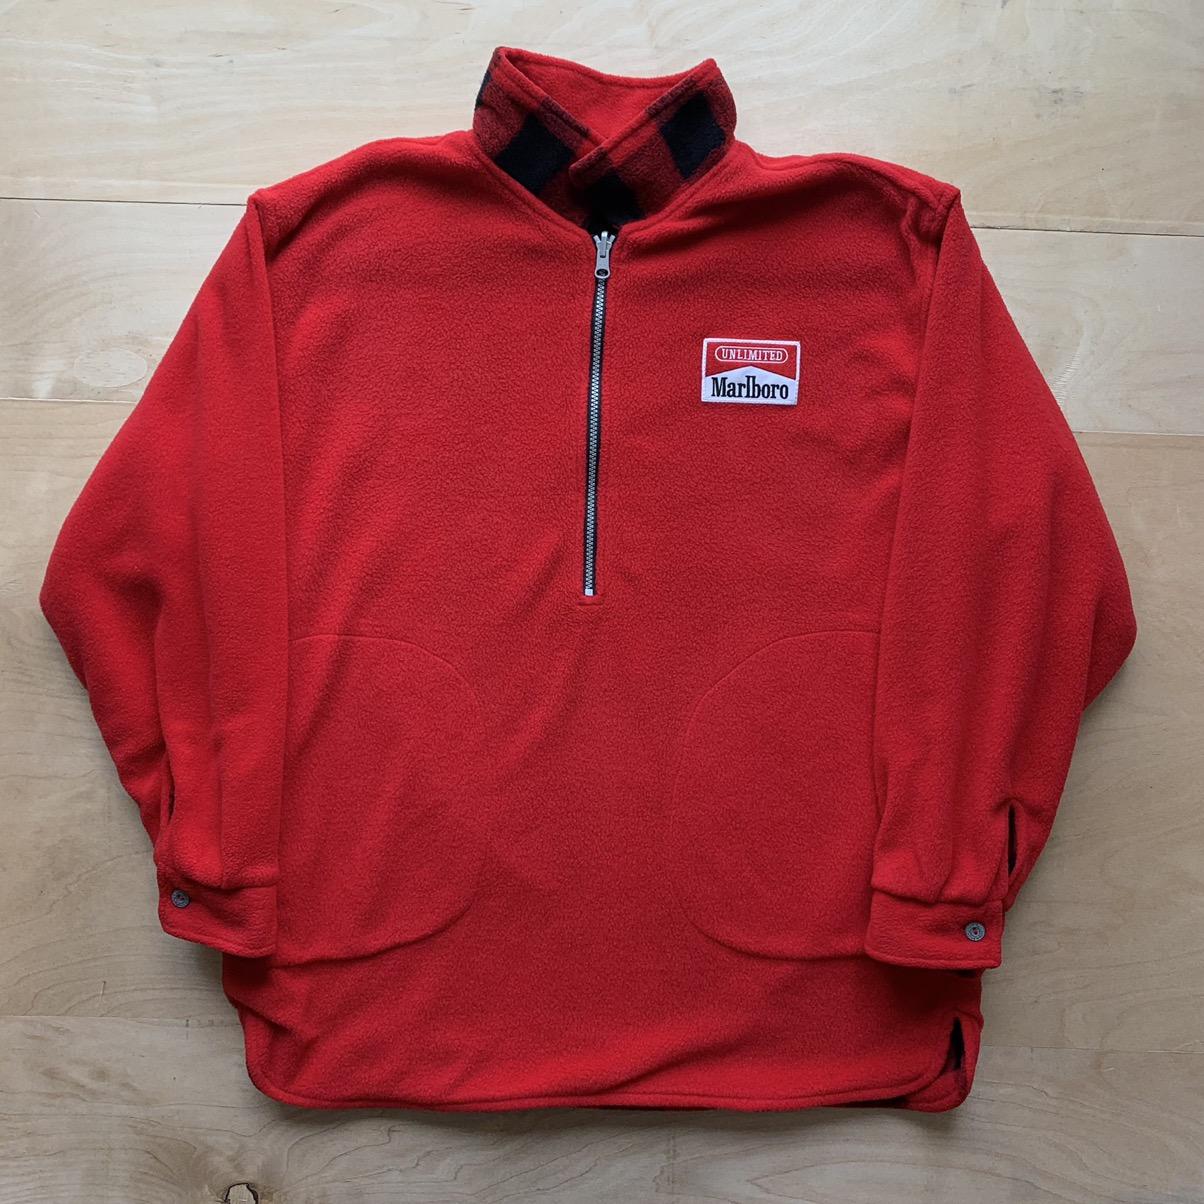 Marlboro Reversible Fleece Pullover Jacket